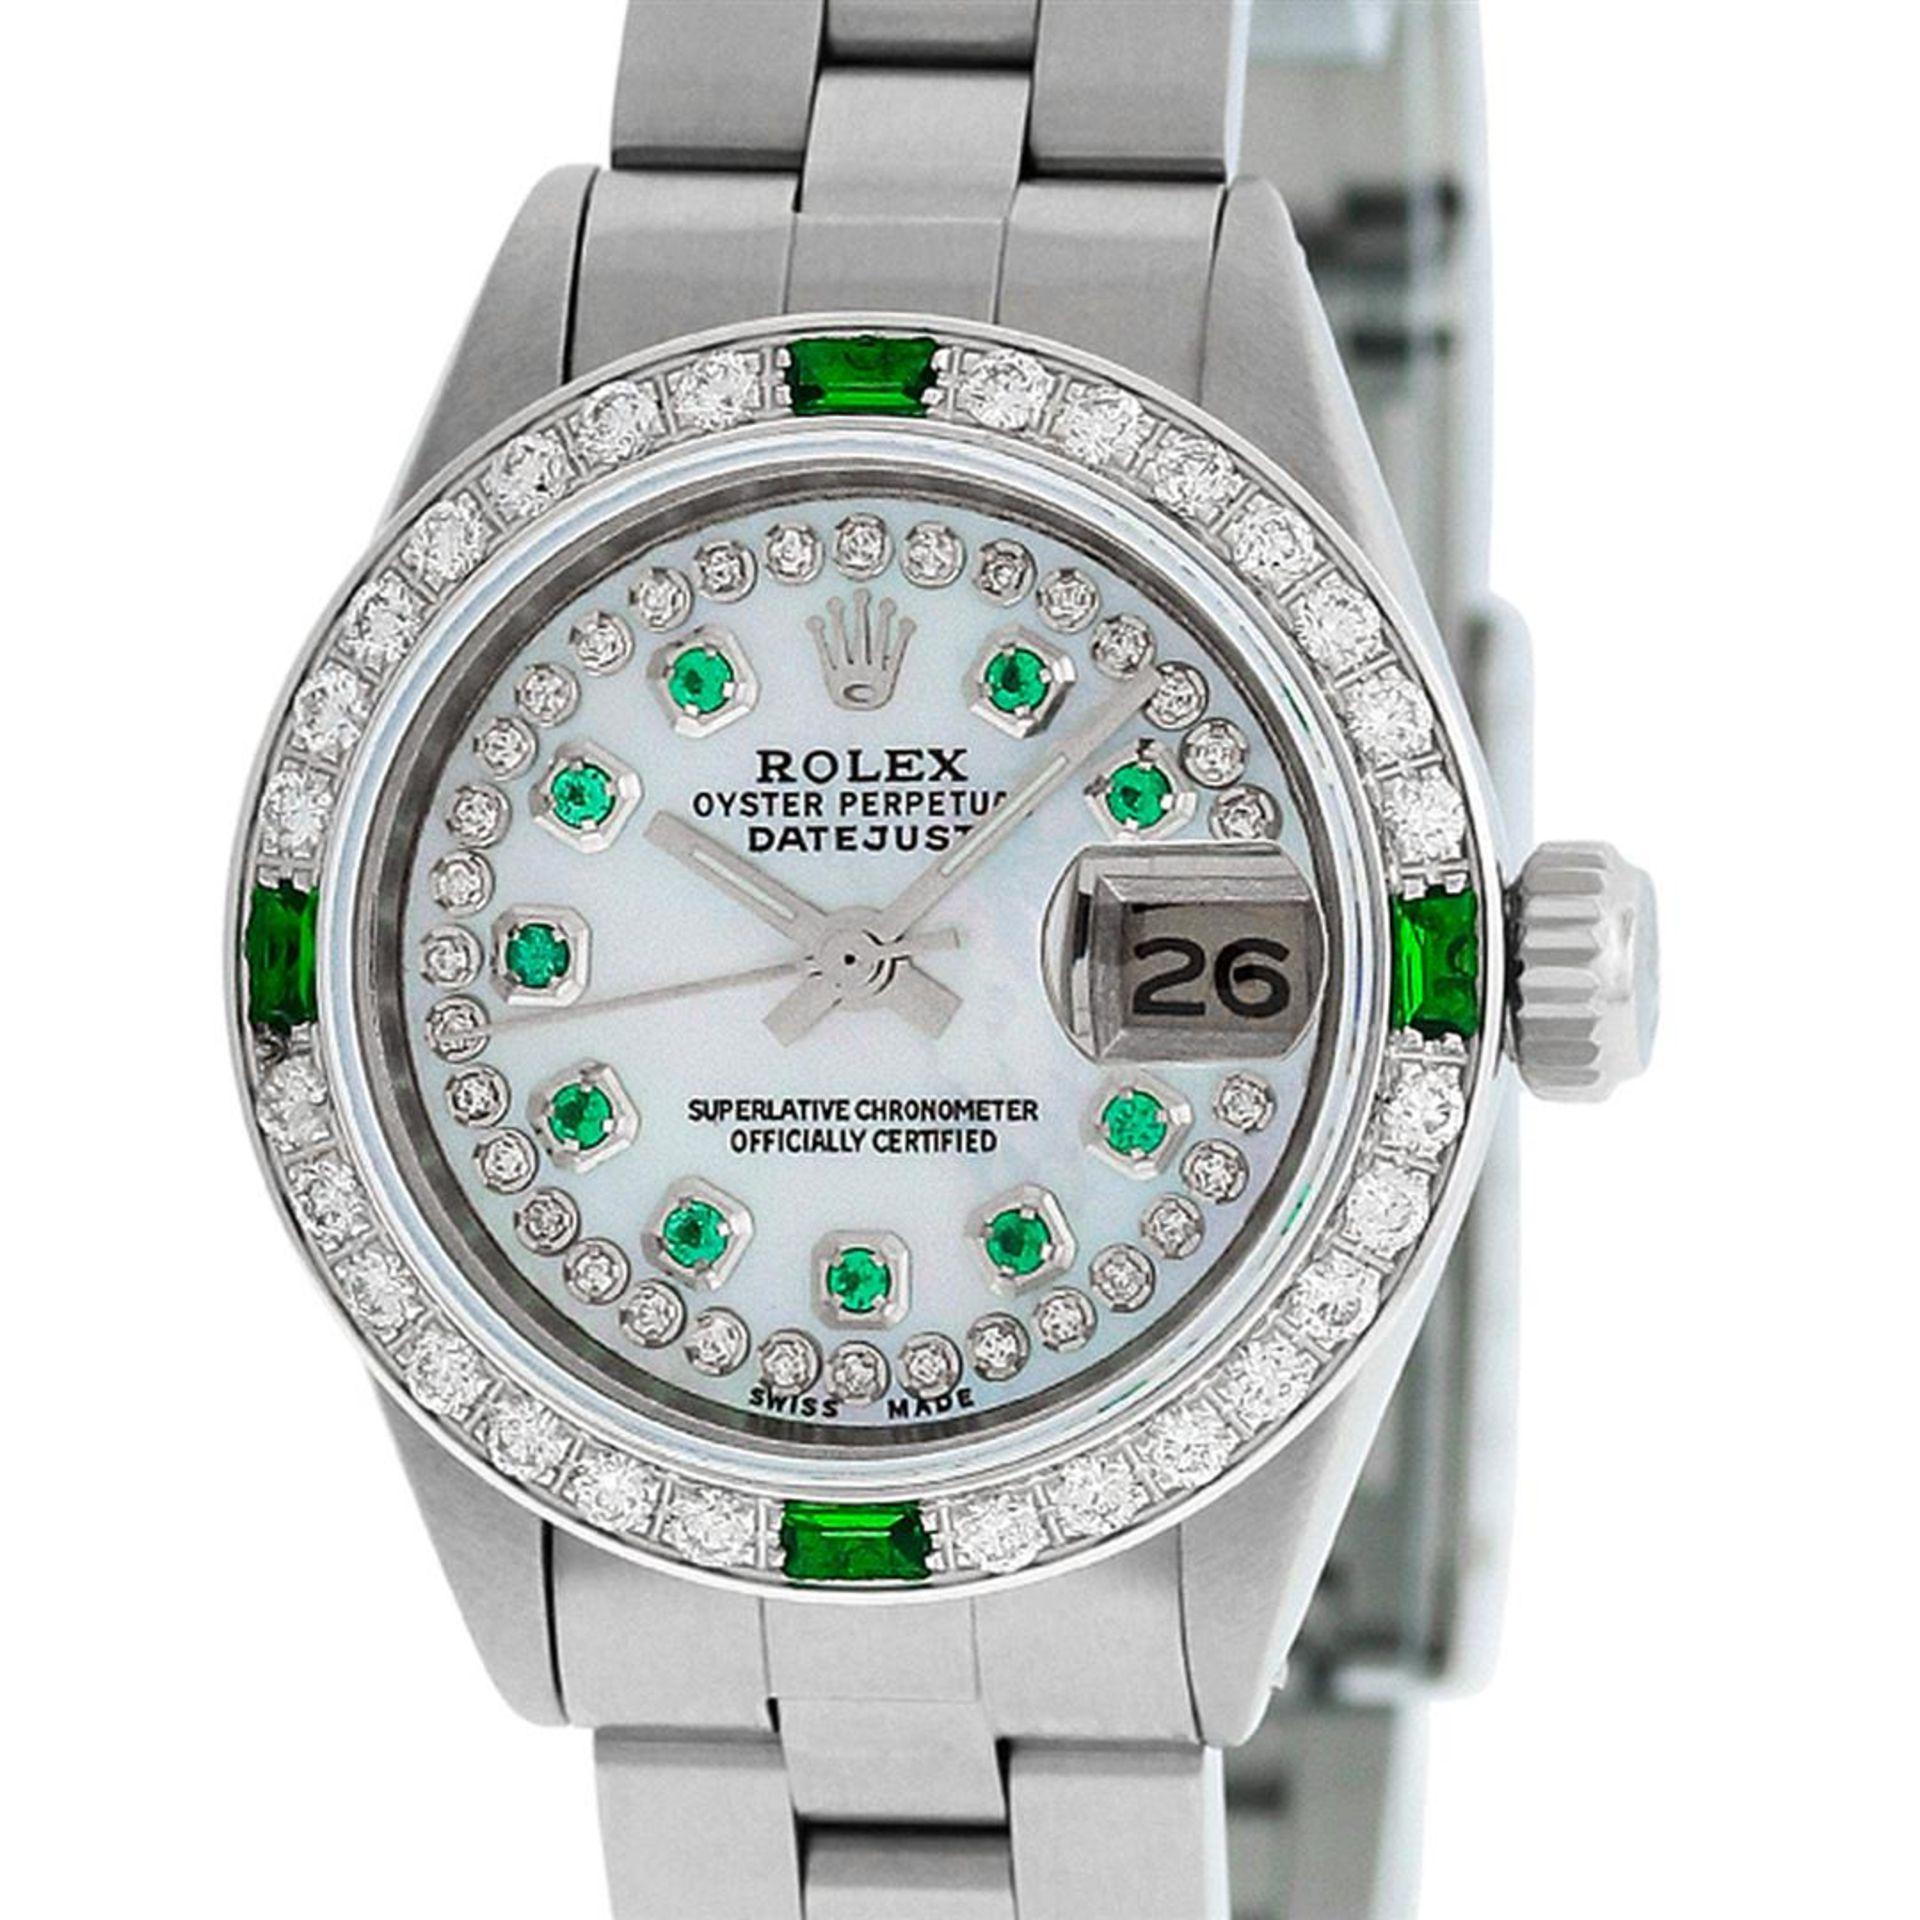 Rolex Ladies Stainless Steel MOP Emerald & Diamond Oyster Perpetaul Datejust Wri - Image 4 of 9